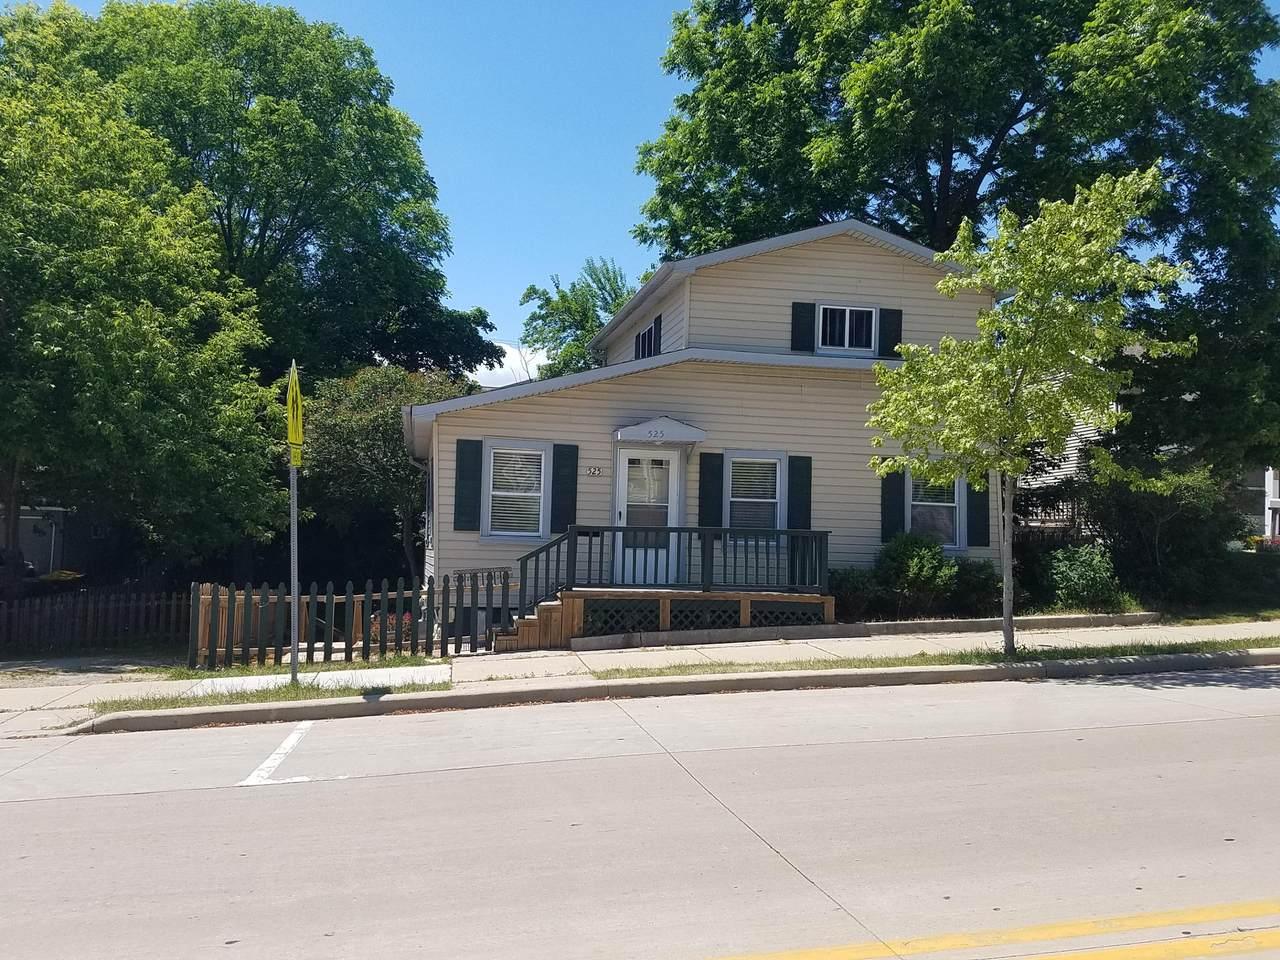 525 Wisconsin St - Photo 1